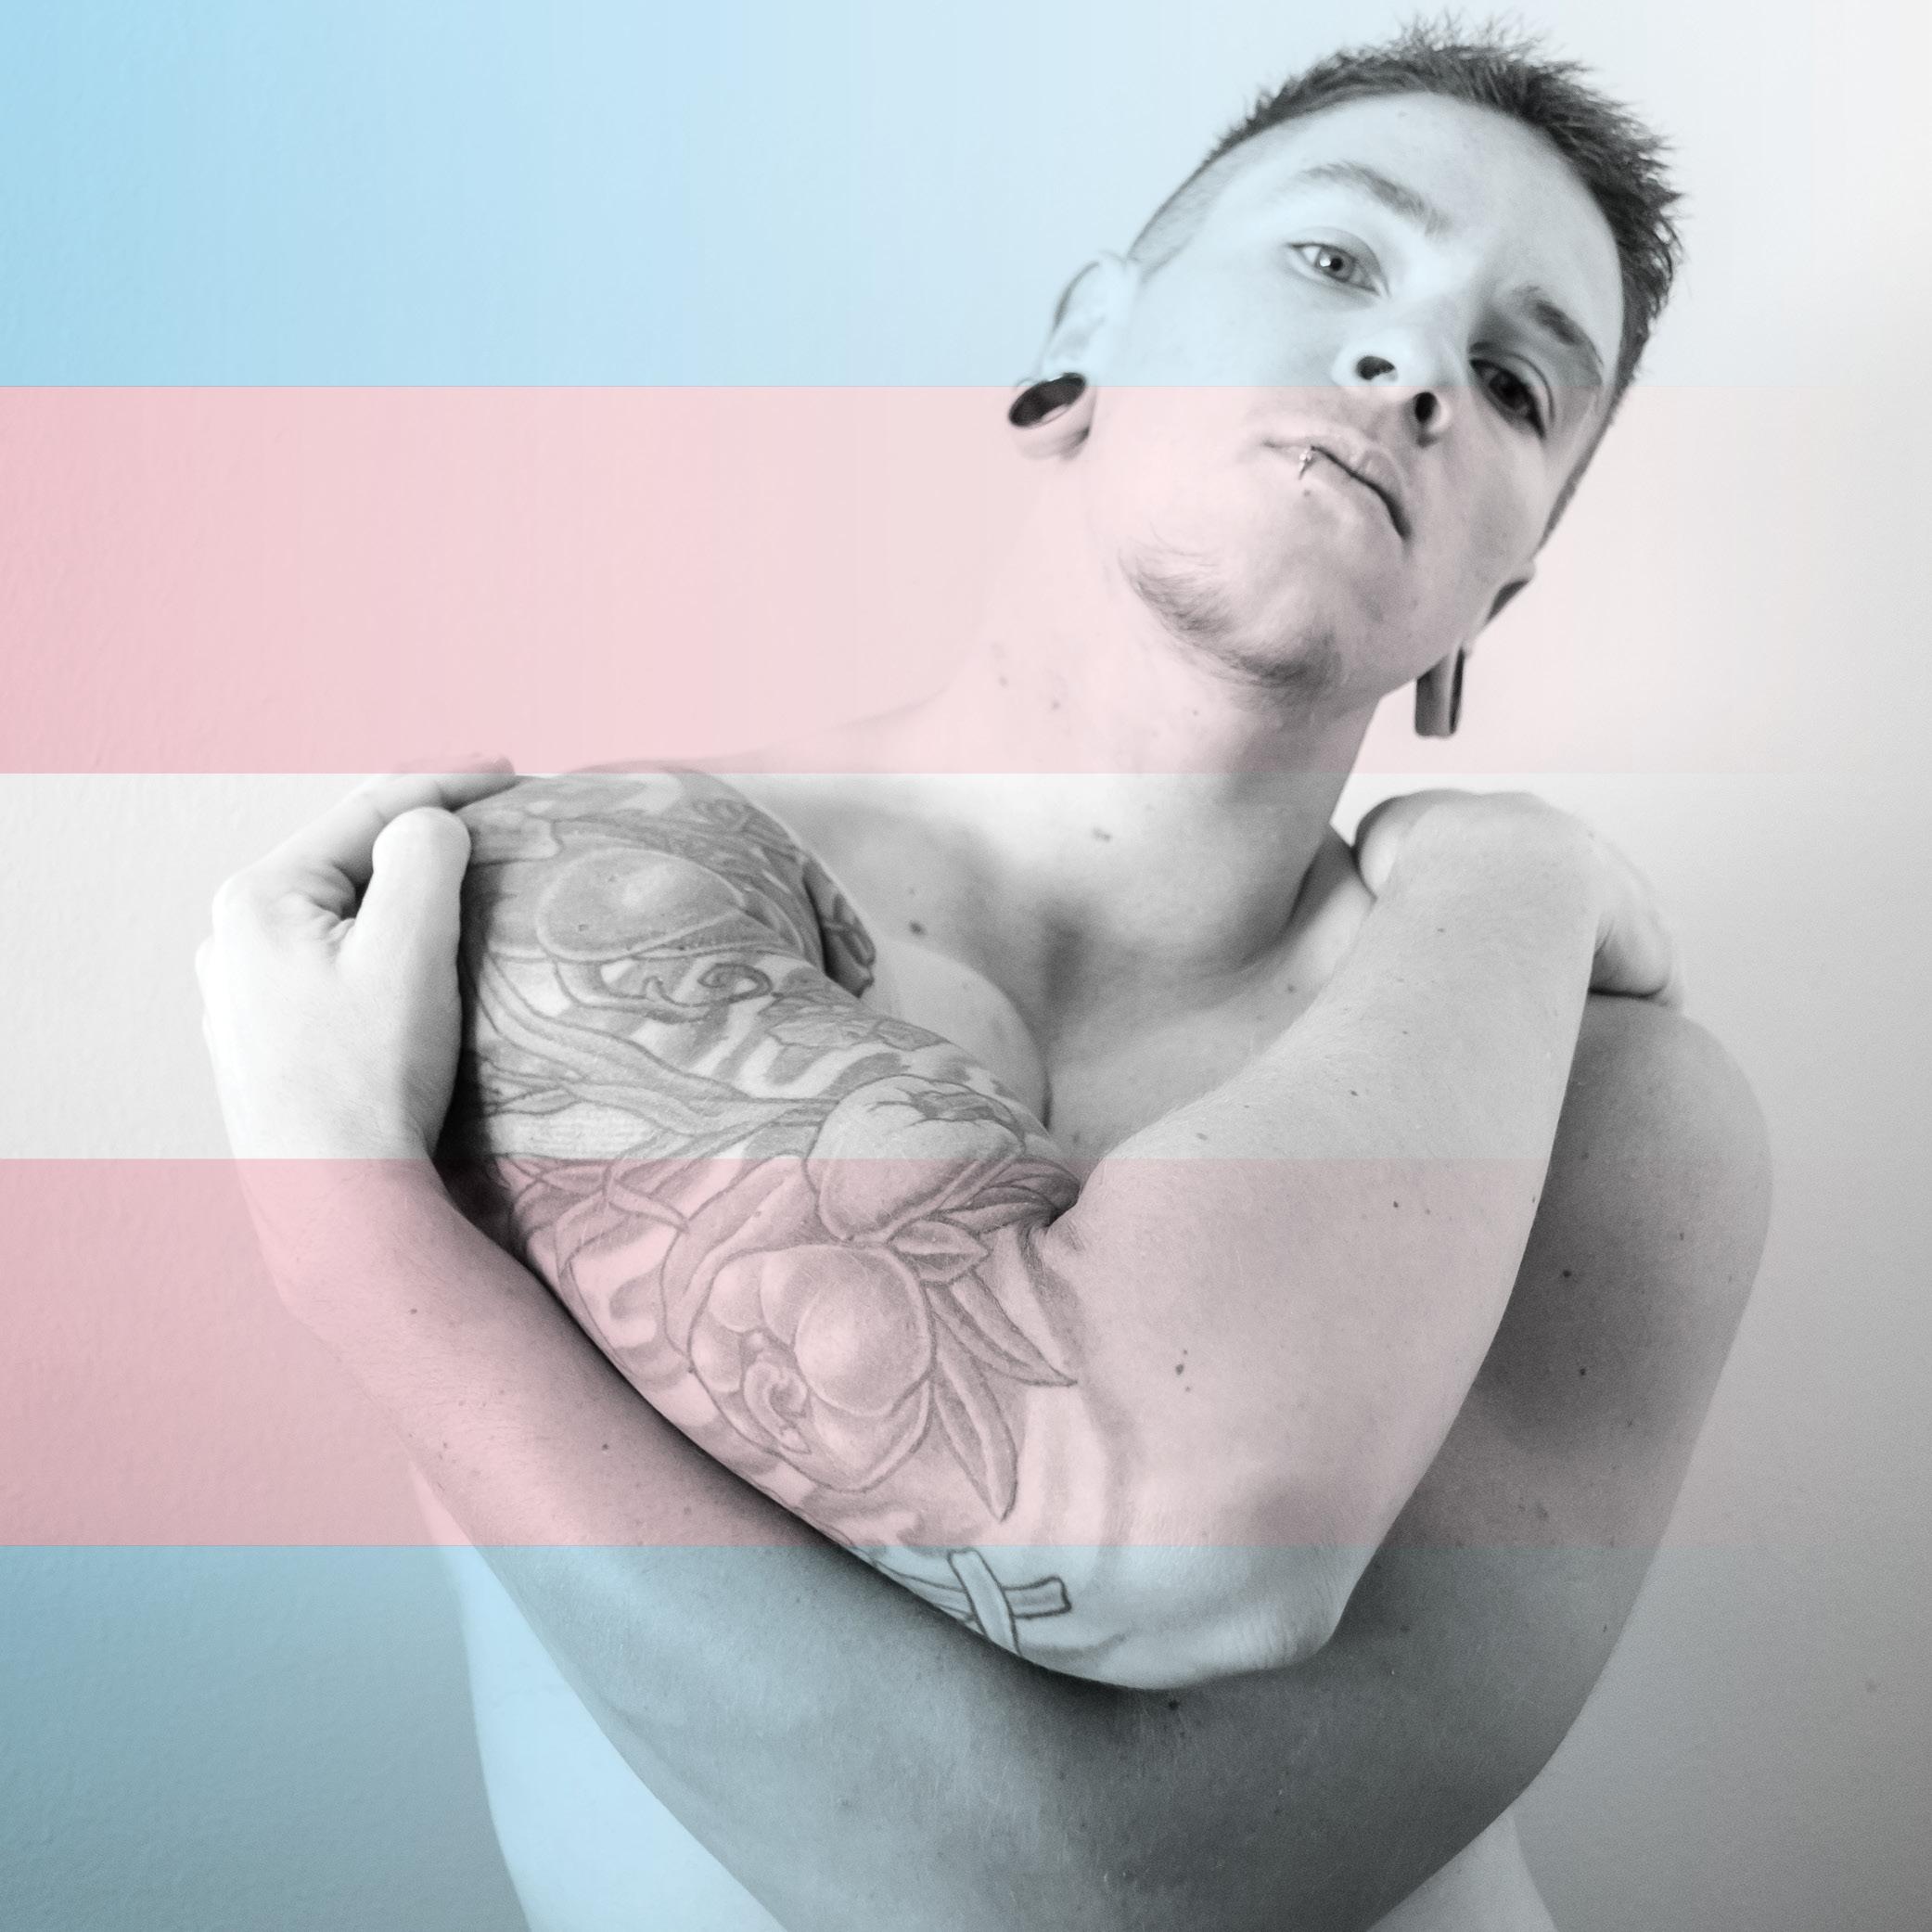 River-Runs-Wild-National-Coming-Out-Day-2017-FTM-Trans-Transman-Transgender-Portrait-River-Eastwood